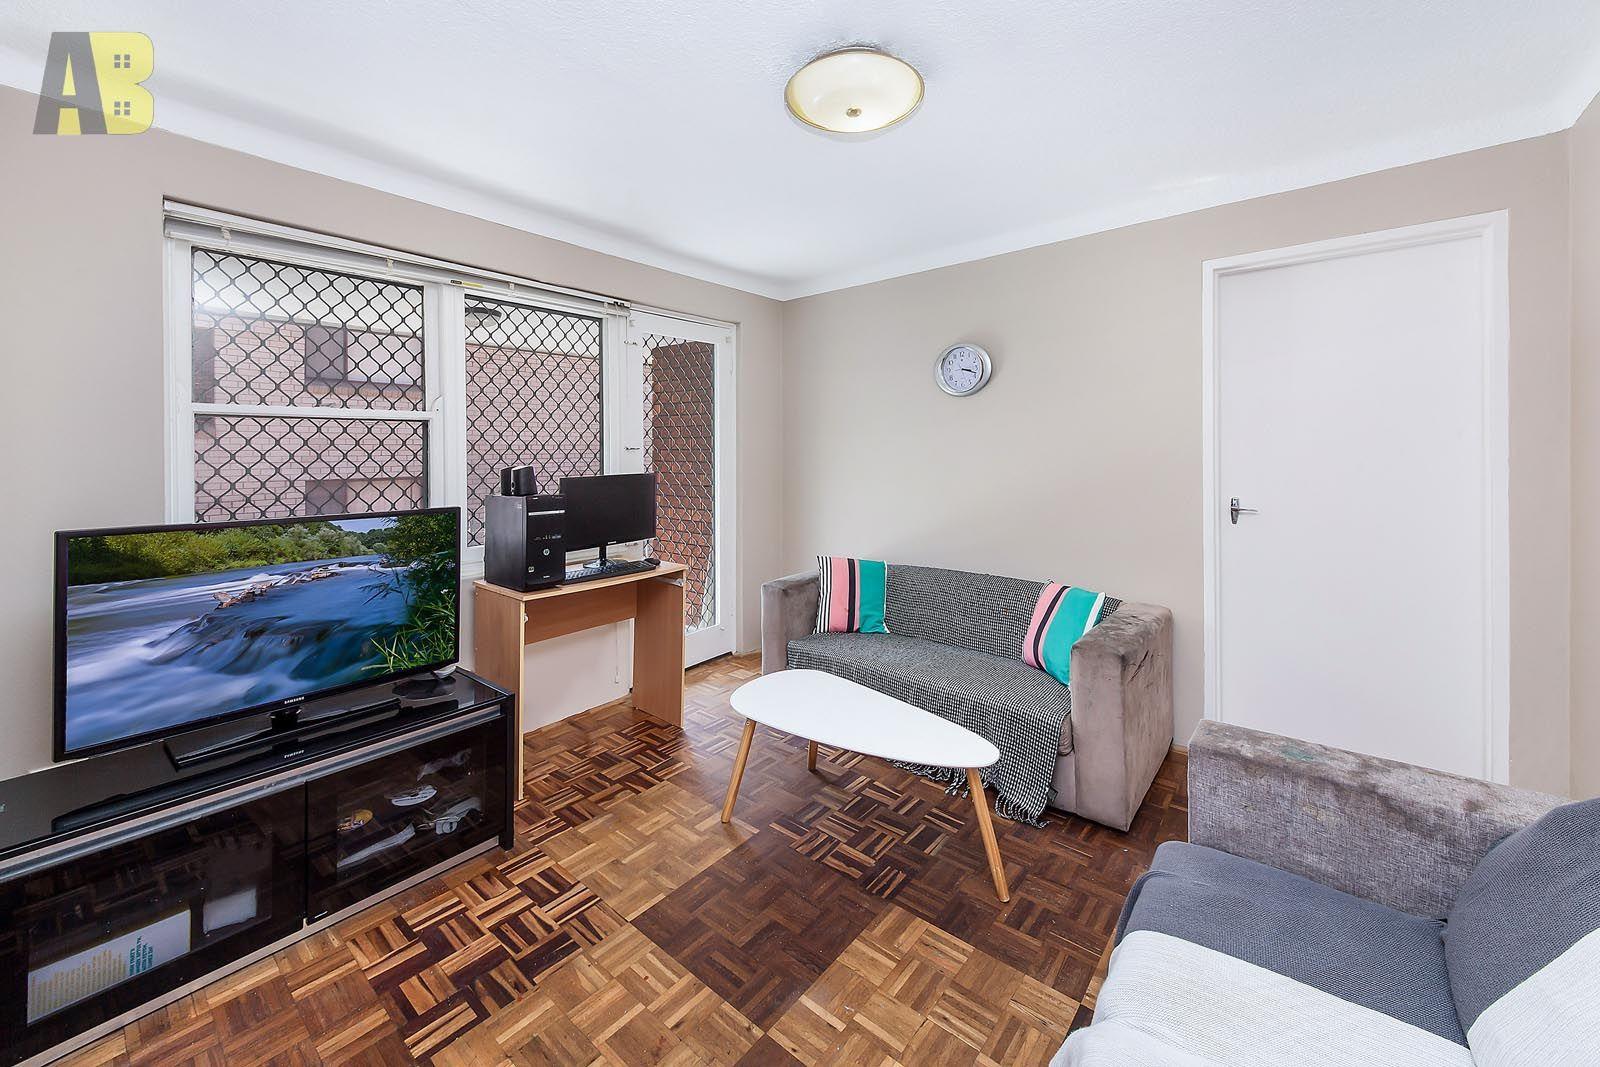 5/10 ALLEN STREET, Harris Park NSW 2150, Image 0